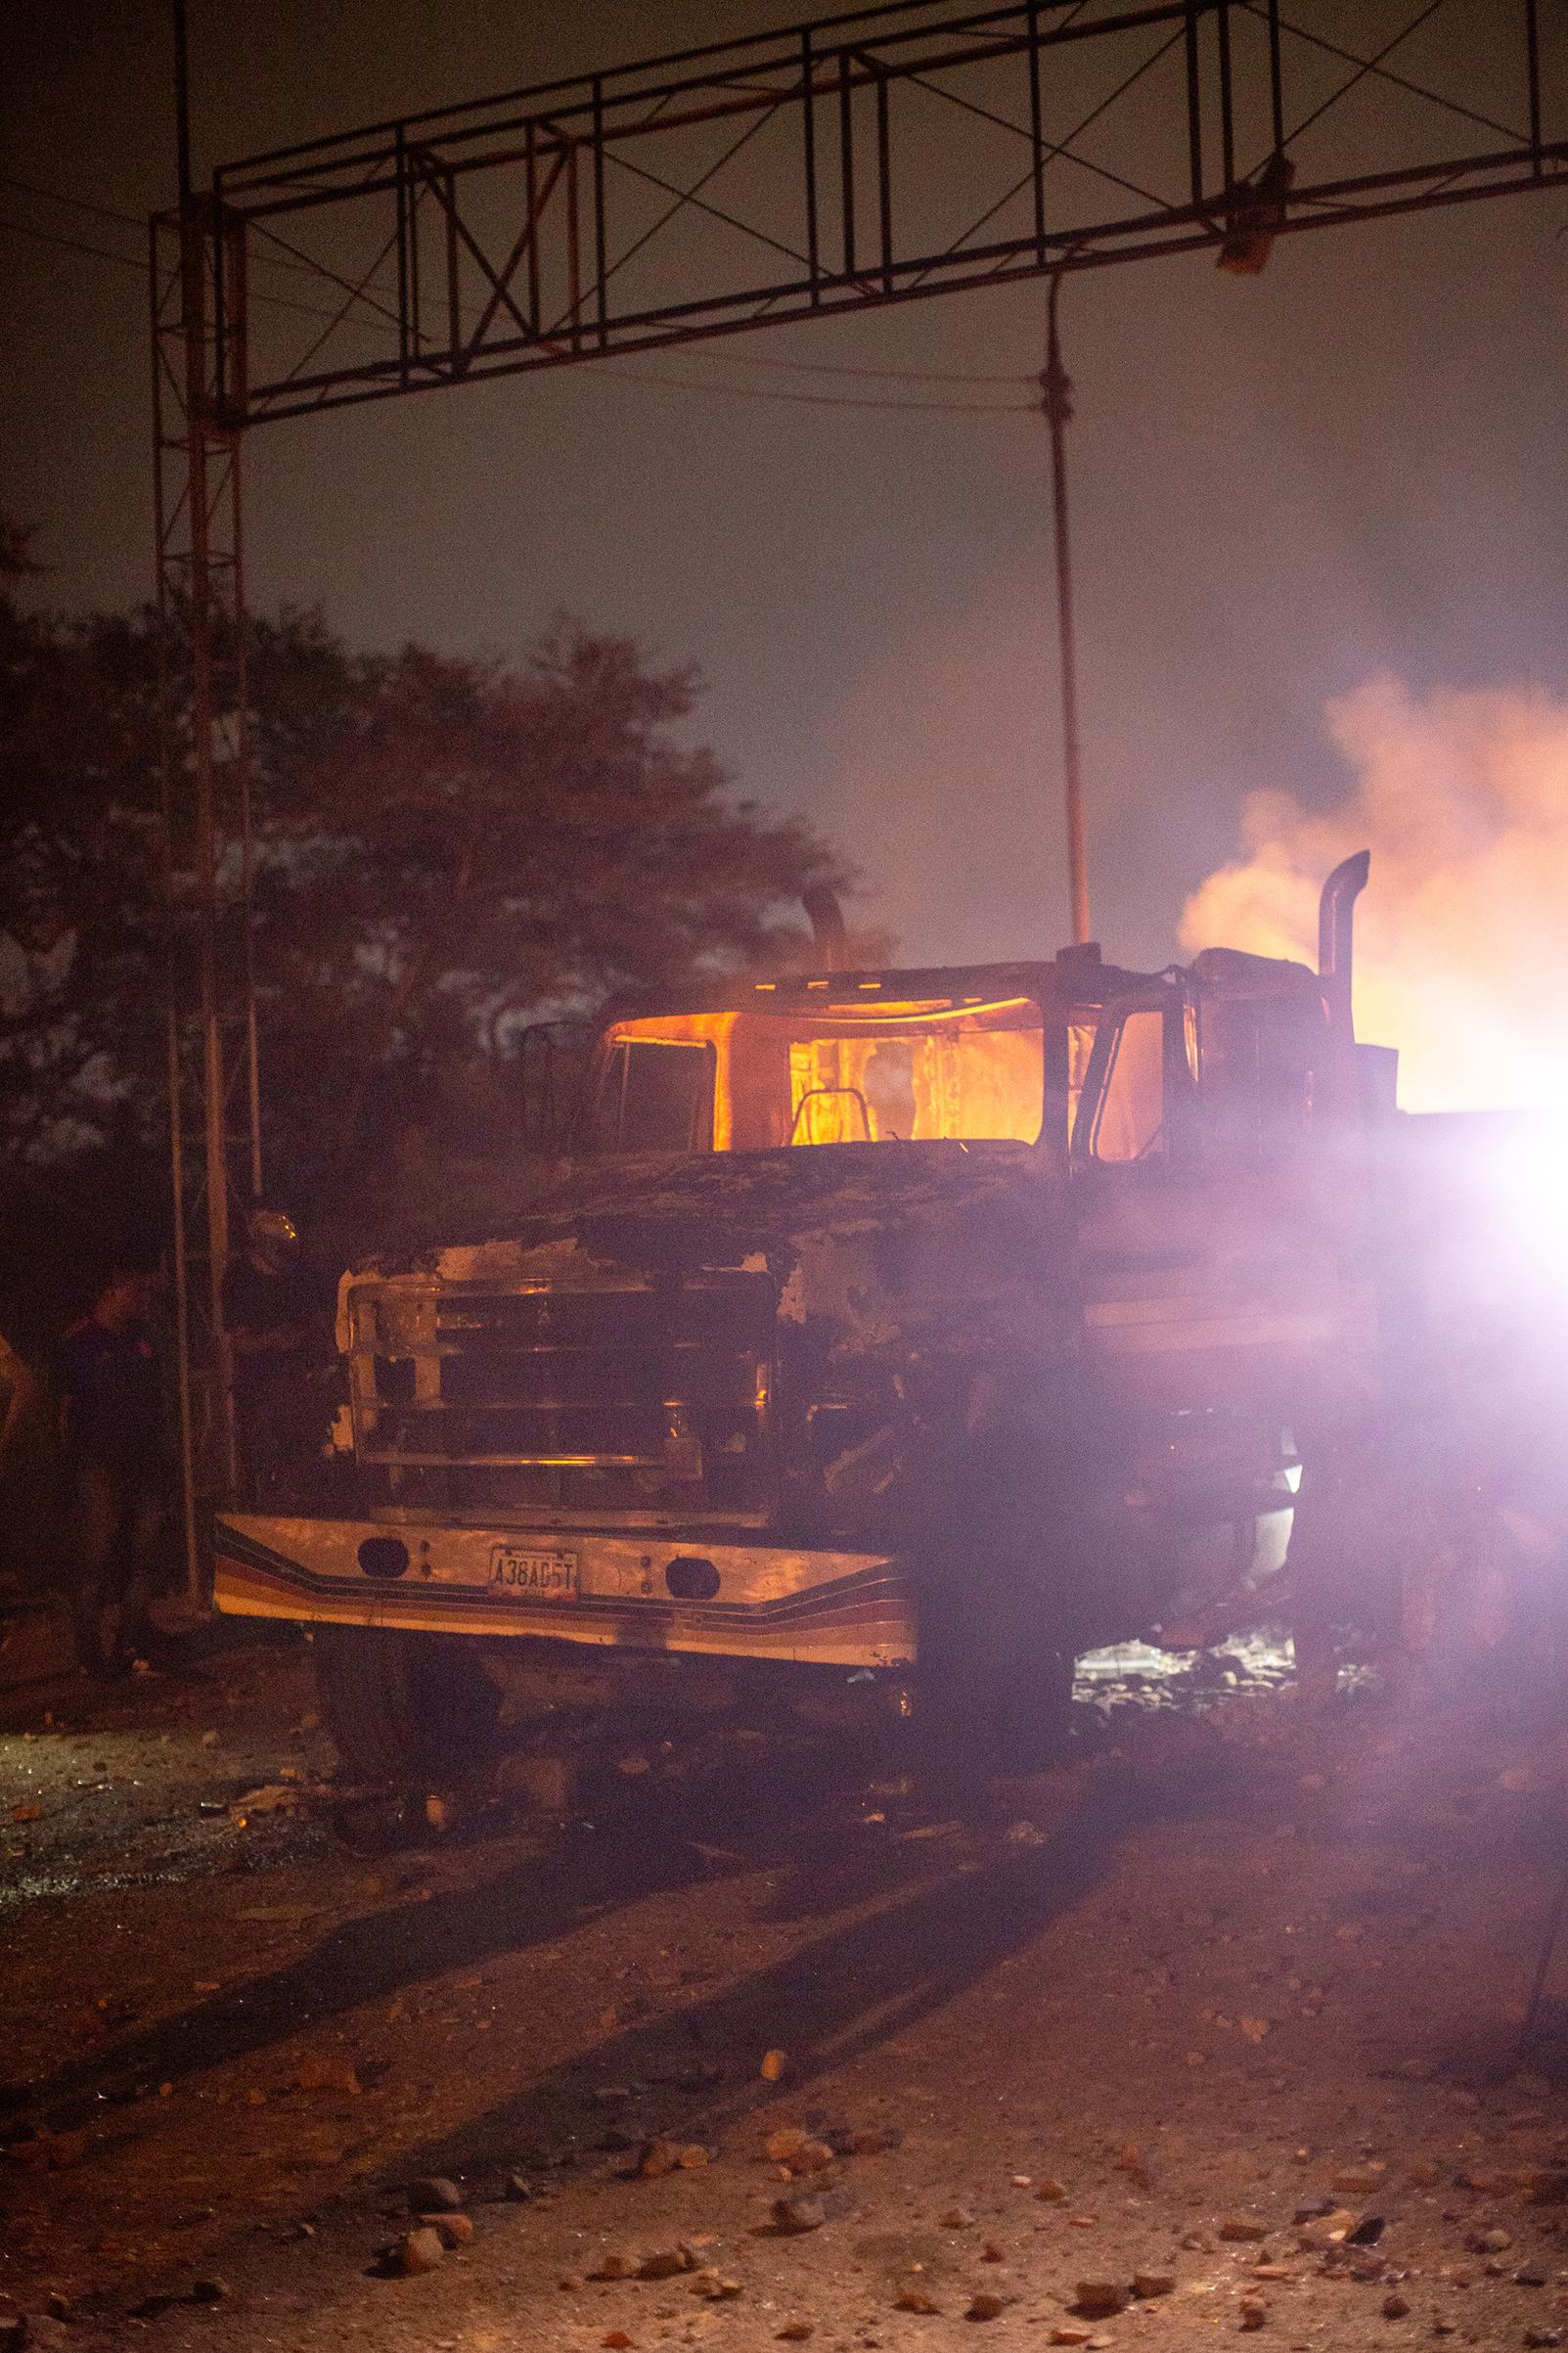 An aid truck burns on the Venezuelan side of a border bridge near the town of Ureña on Feb. 23, 2019.